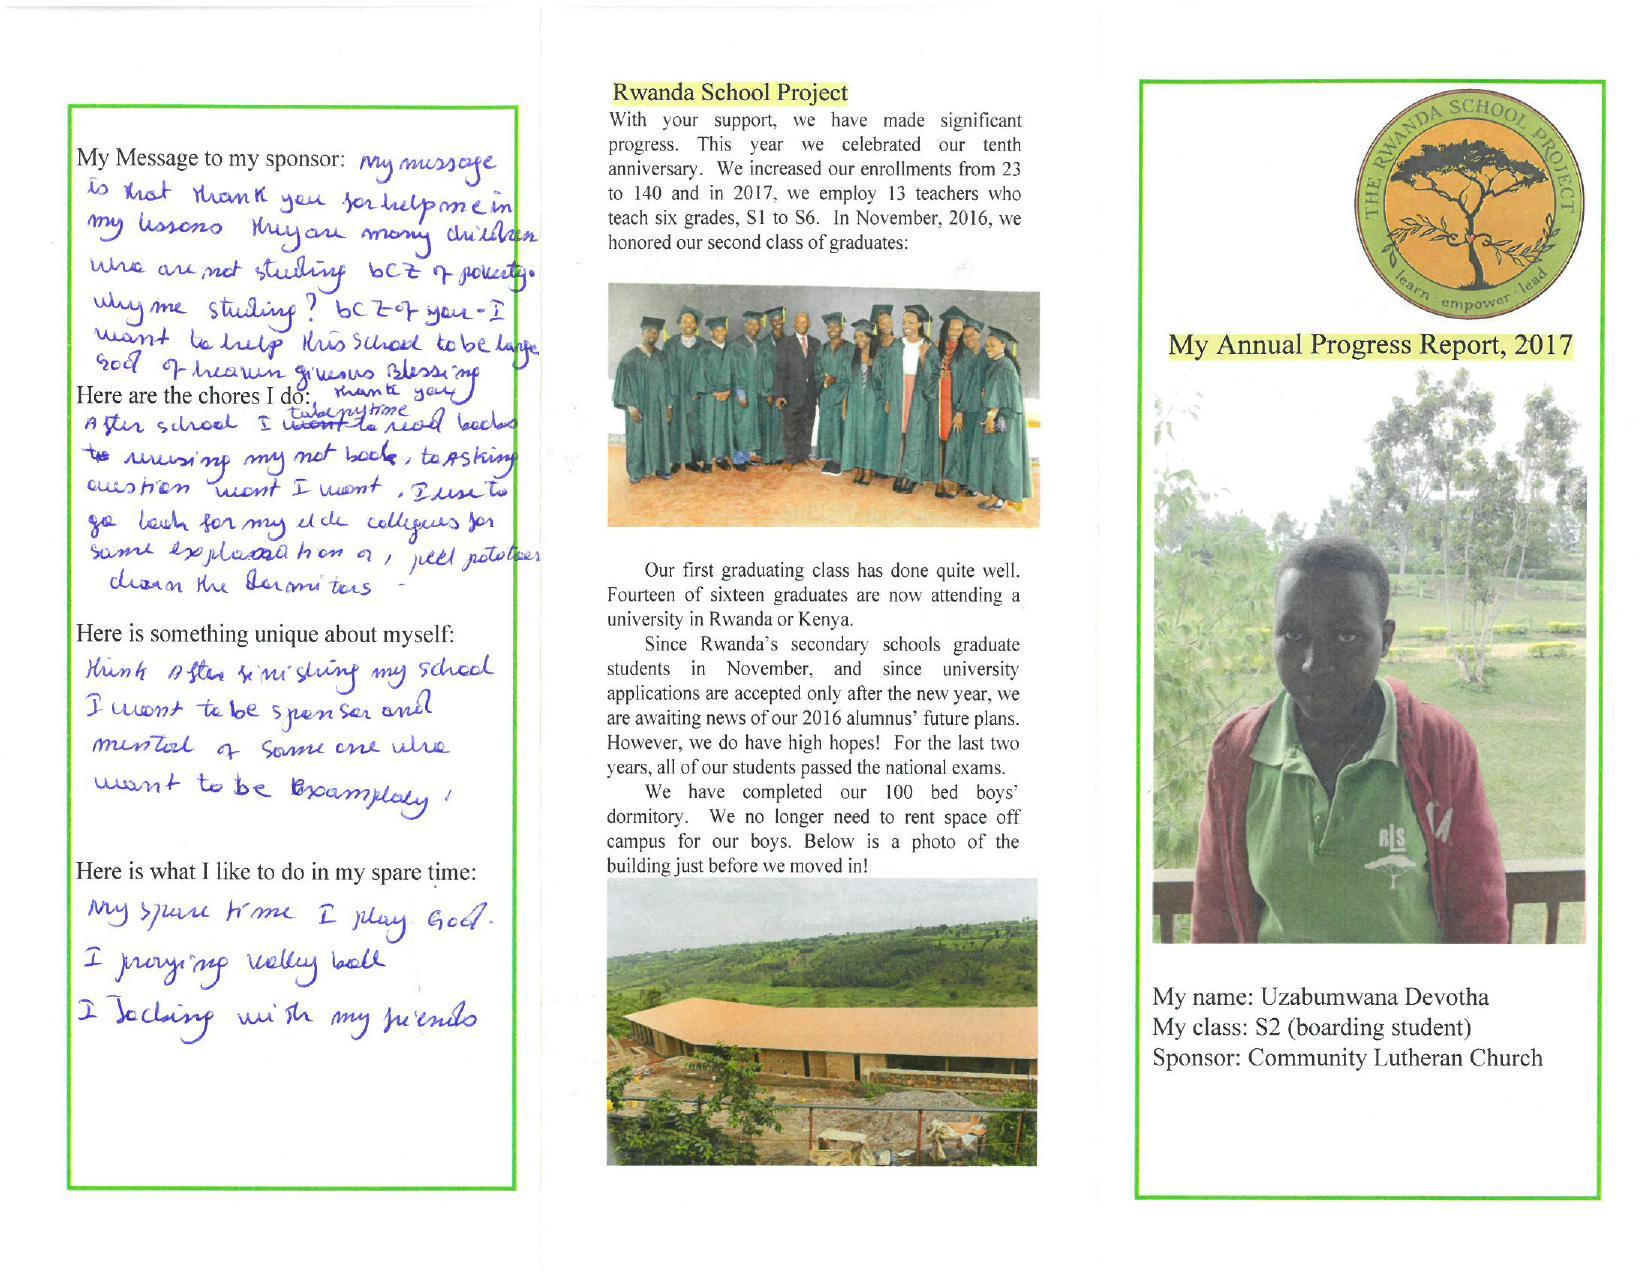 skm c554e17051111290 000001 - Wonderful letters from our Rwanda Sponsored Students